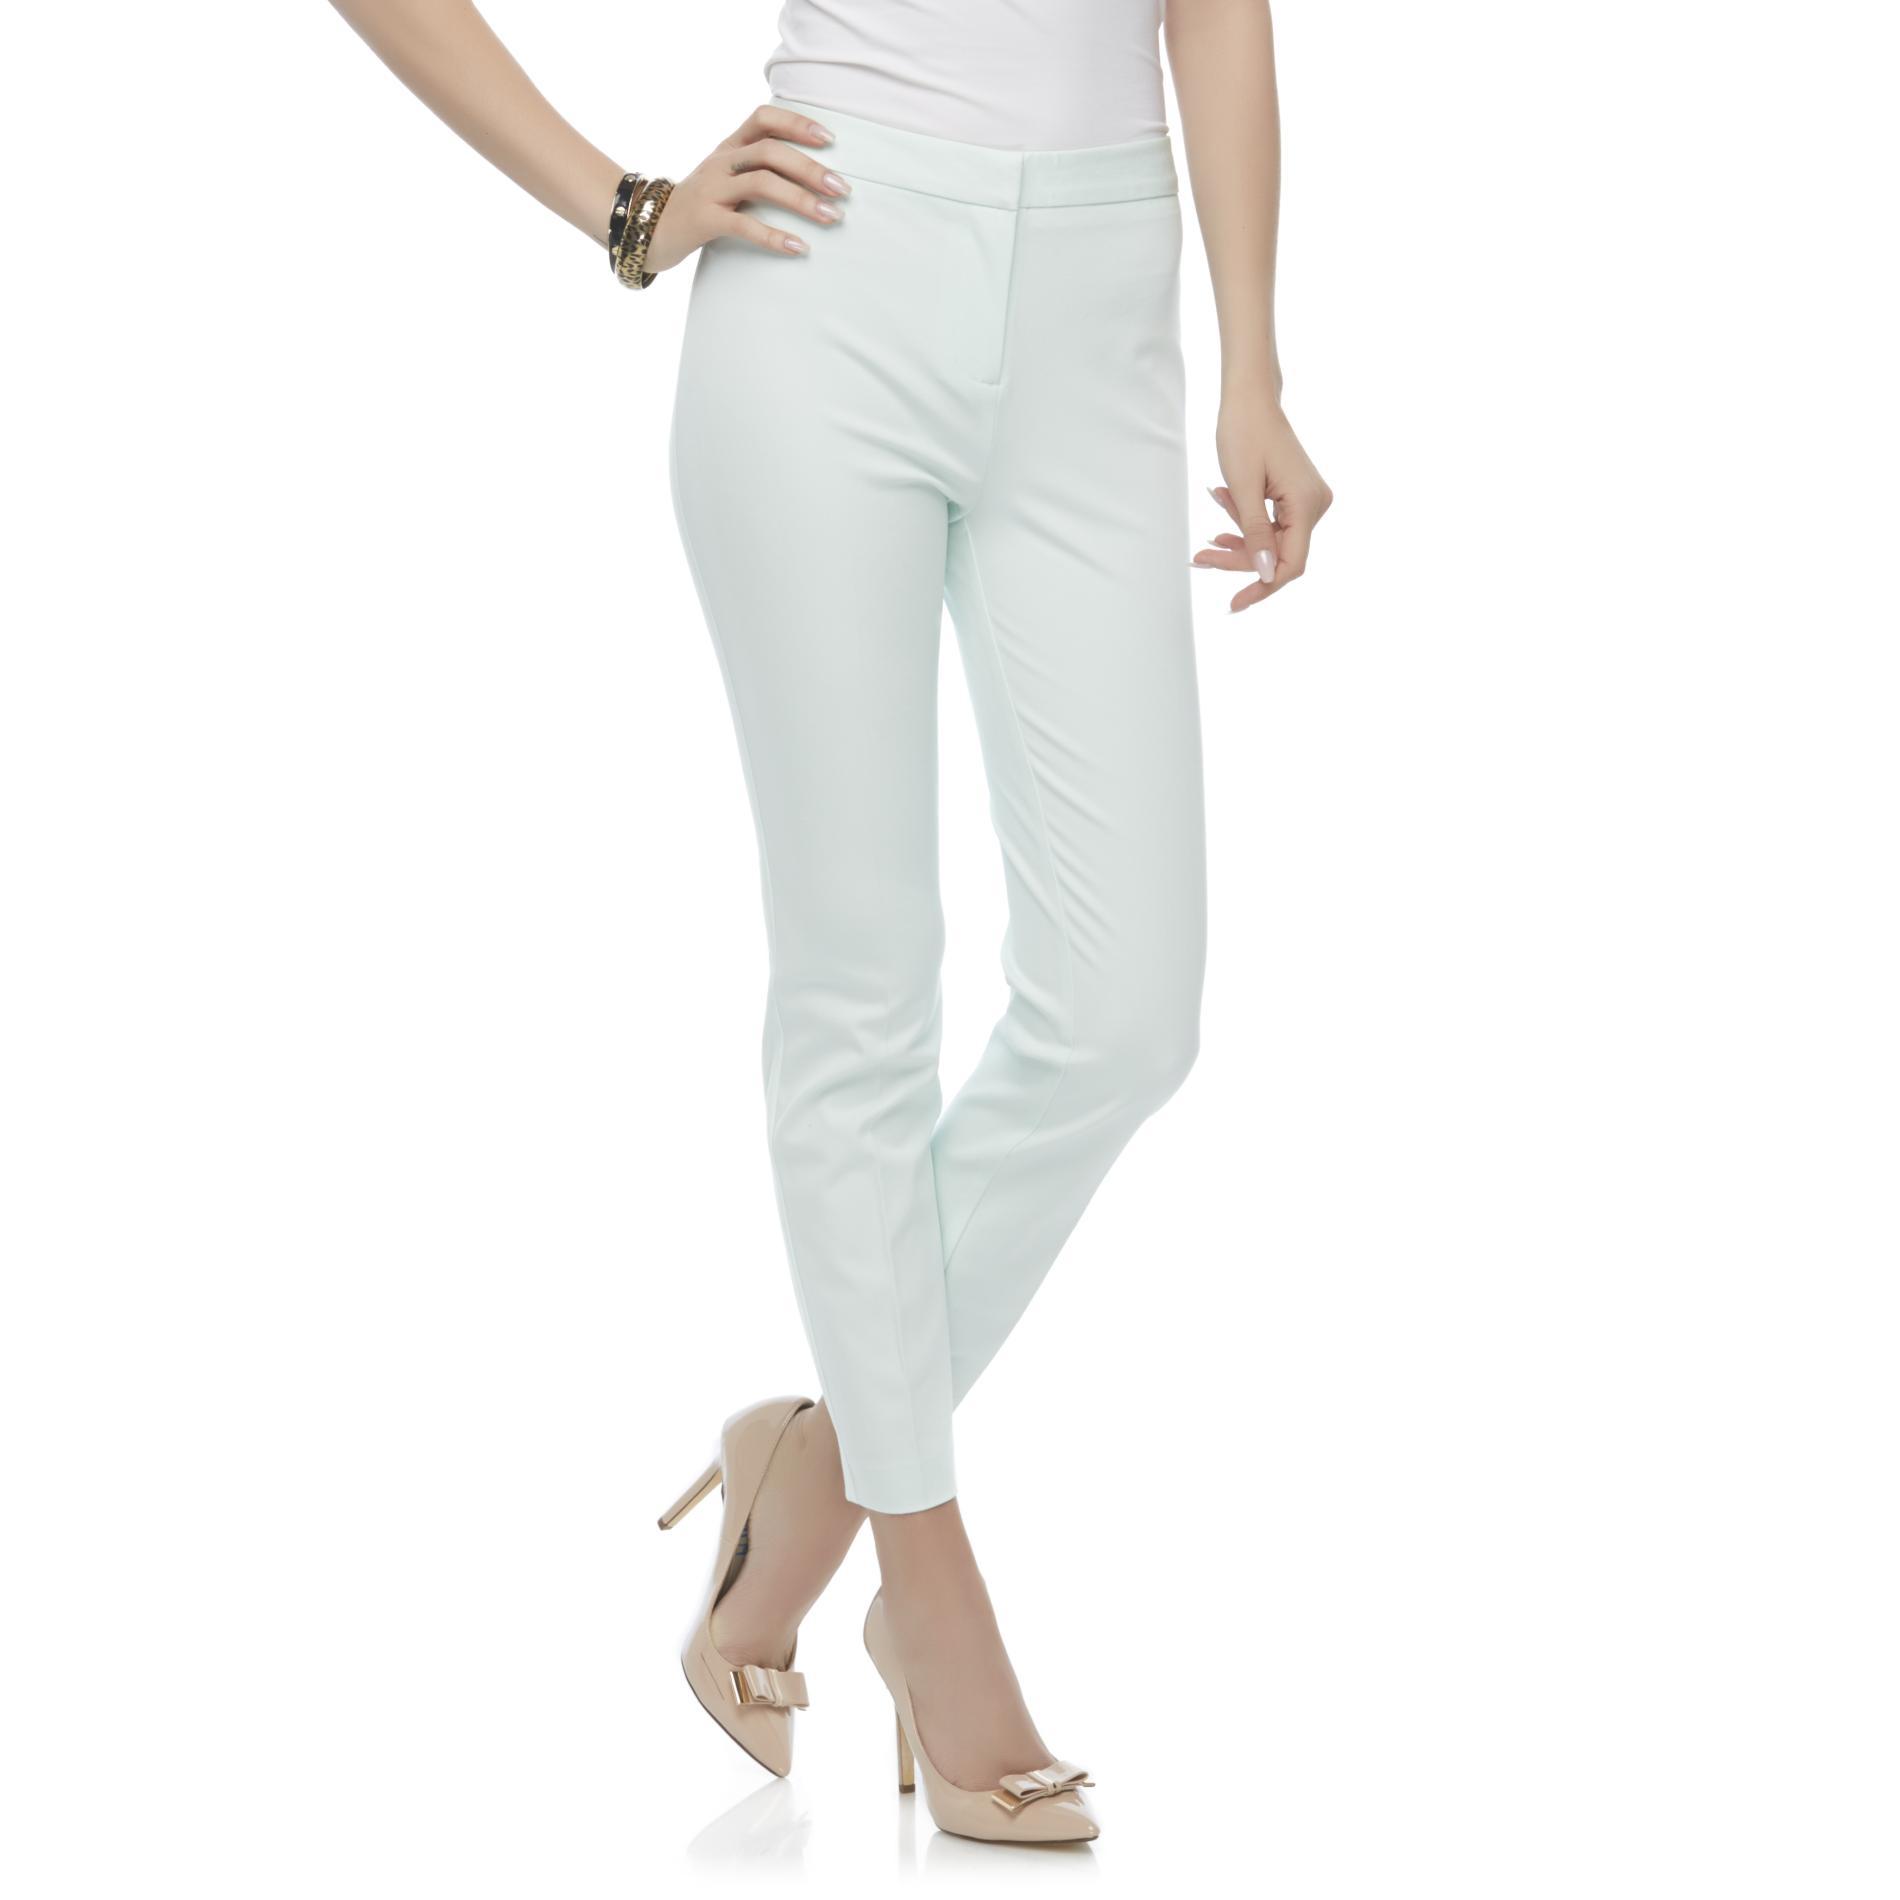 Metaphor Women's Ankle Dress Pants